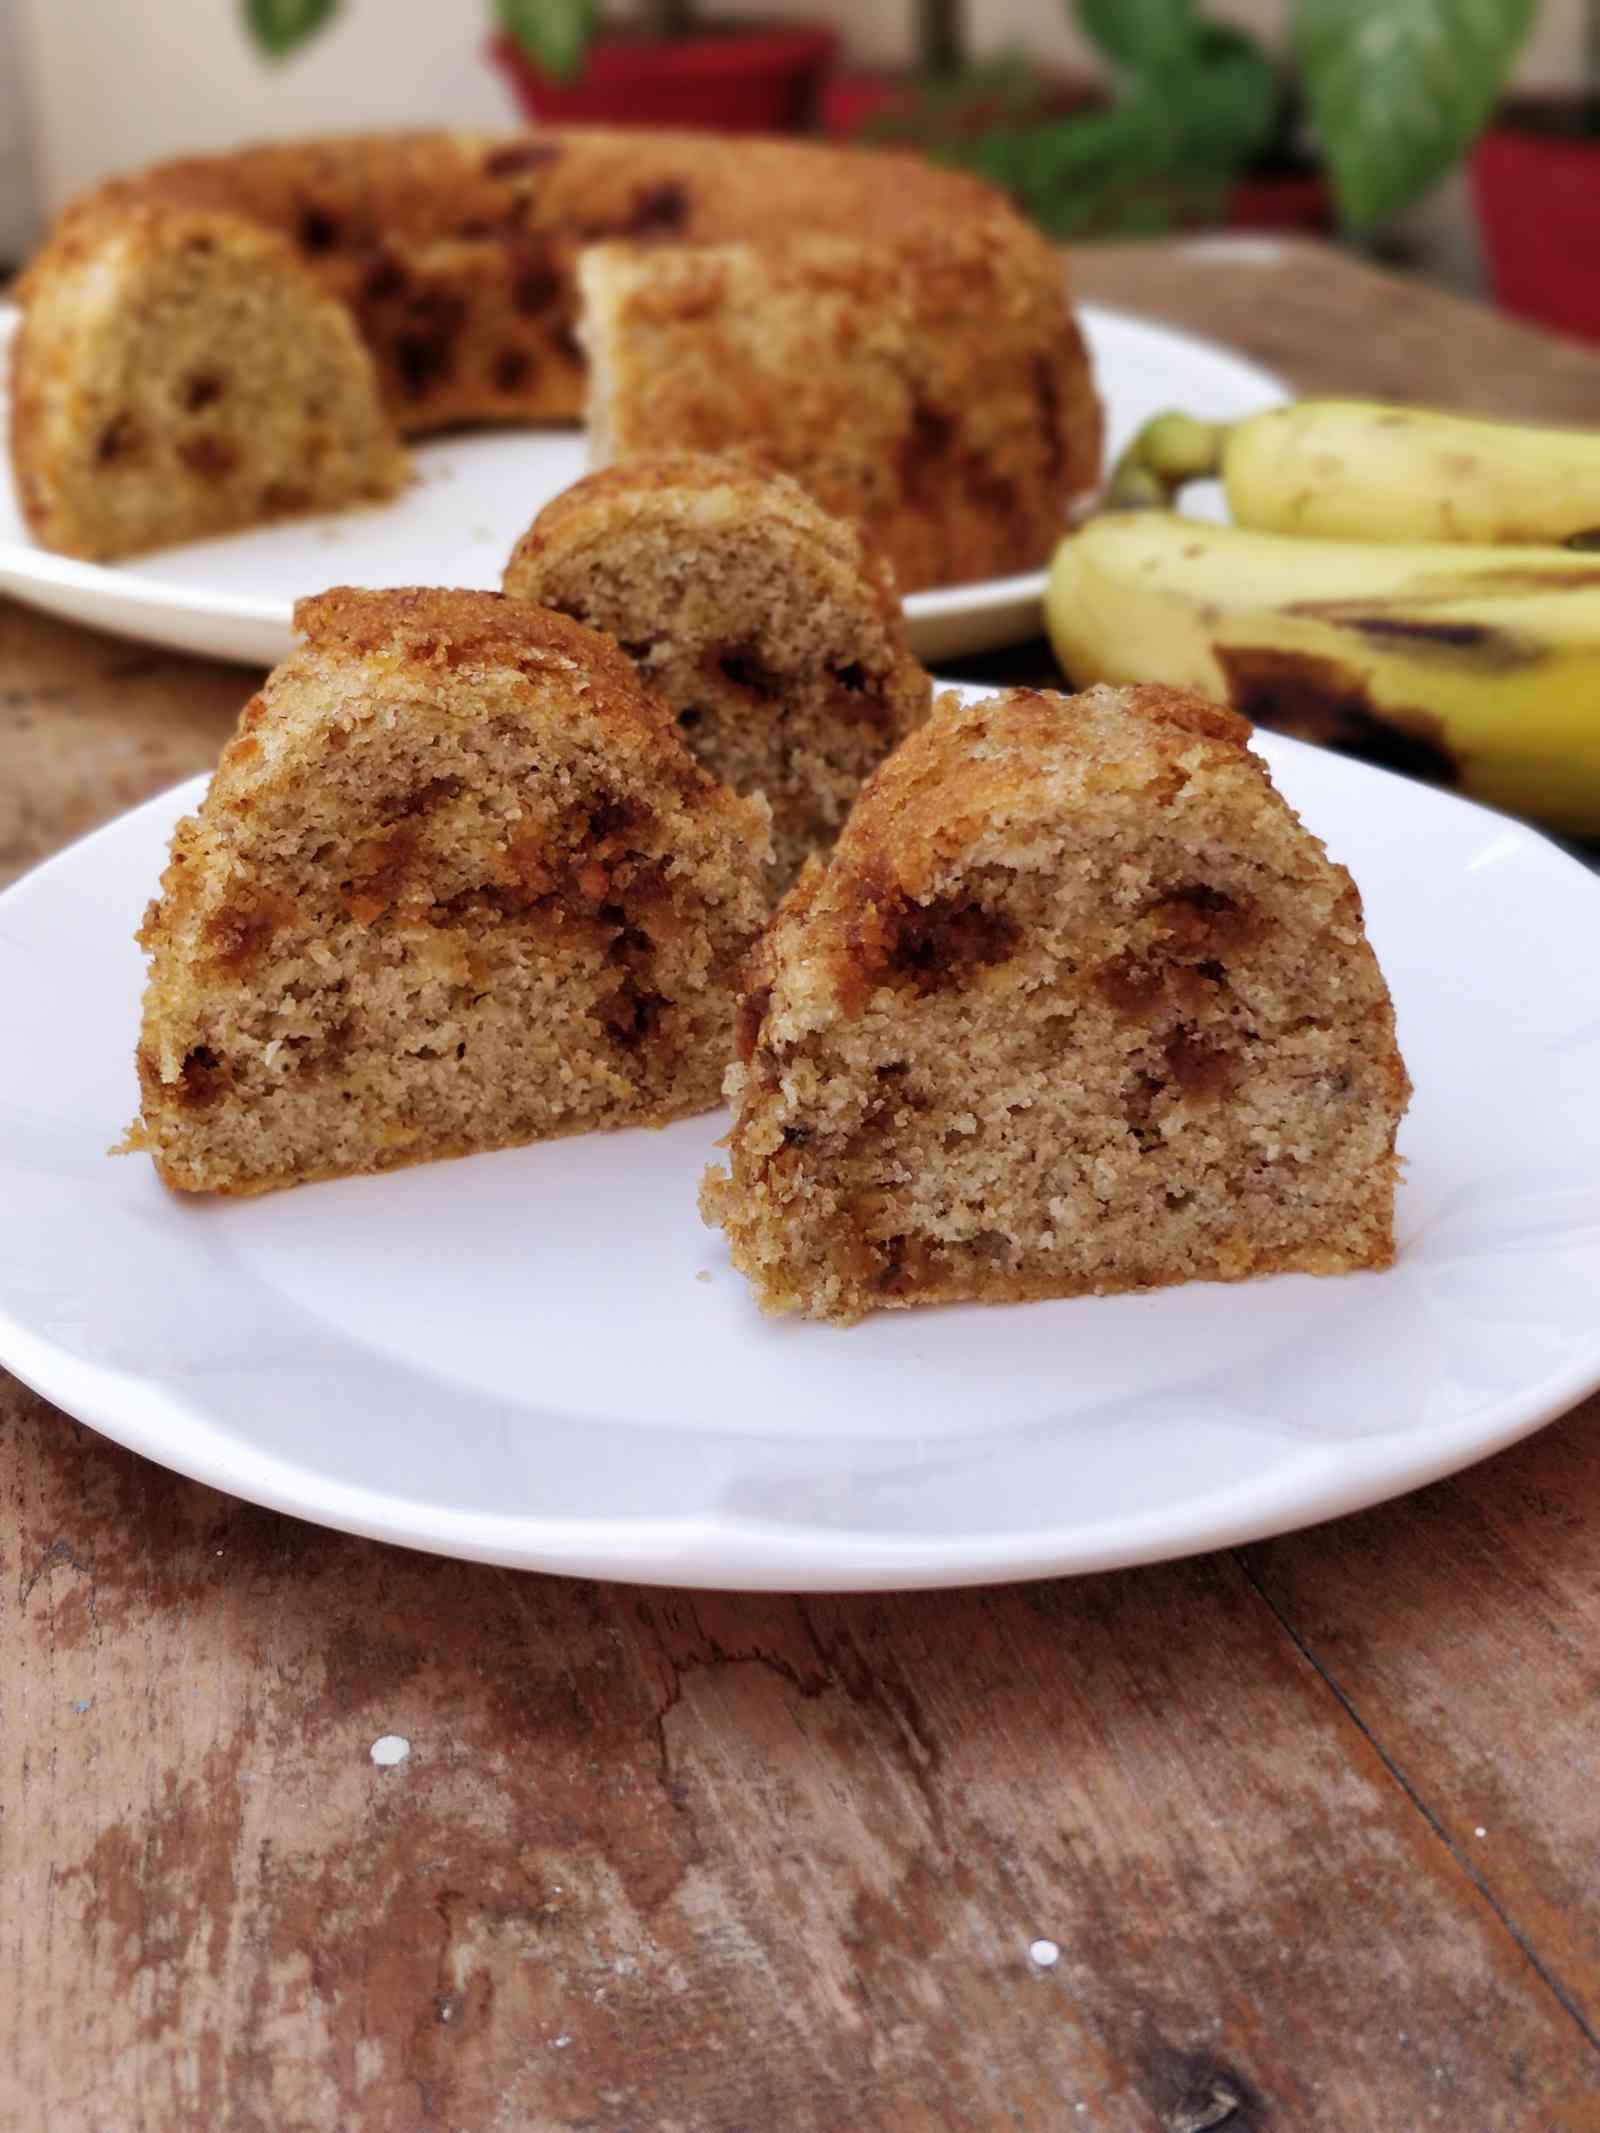 Butterscotch Lunch Box Cake